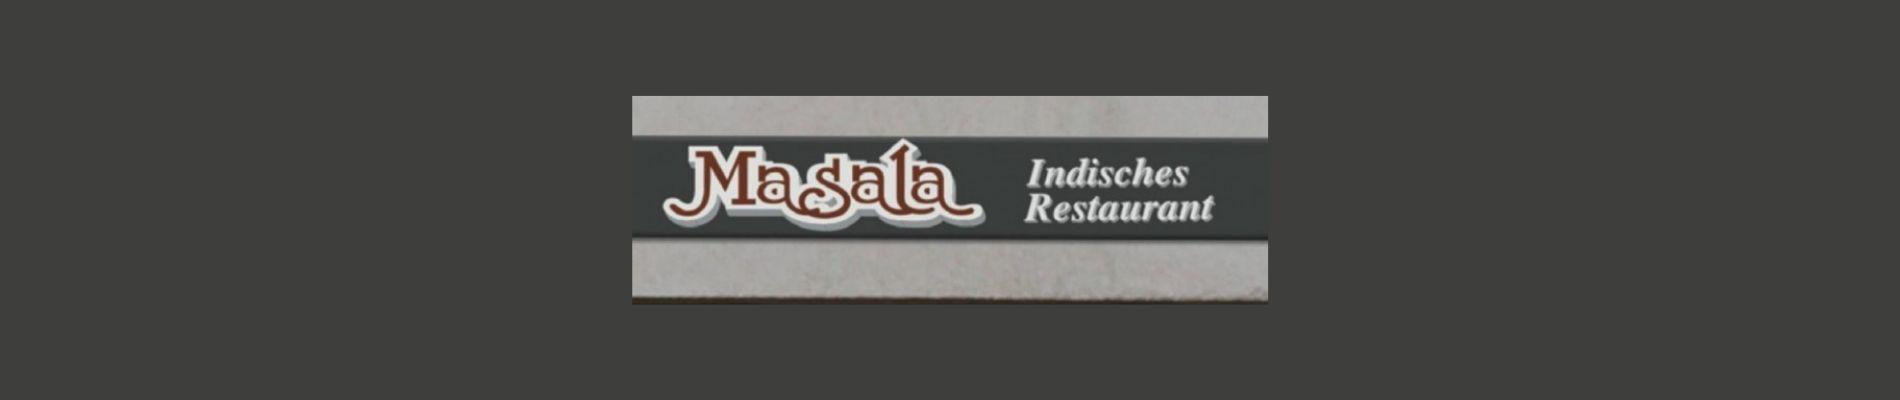 Restaurant Neumarkt Masala Teaser